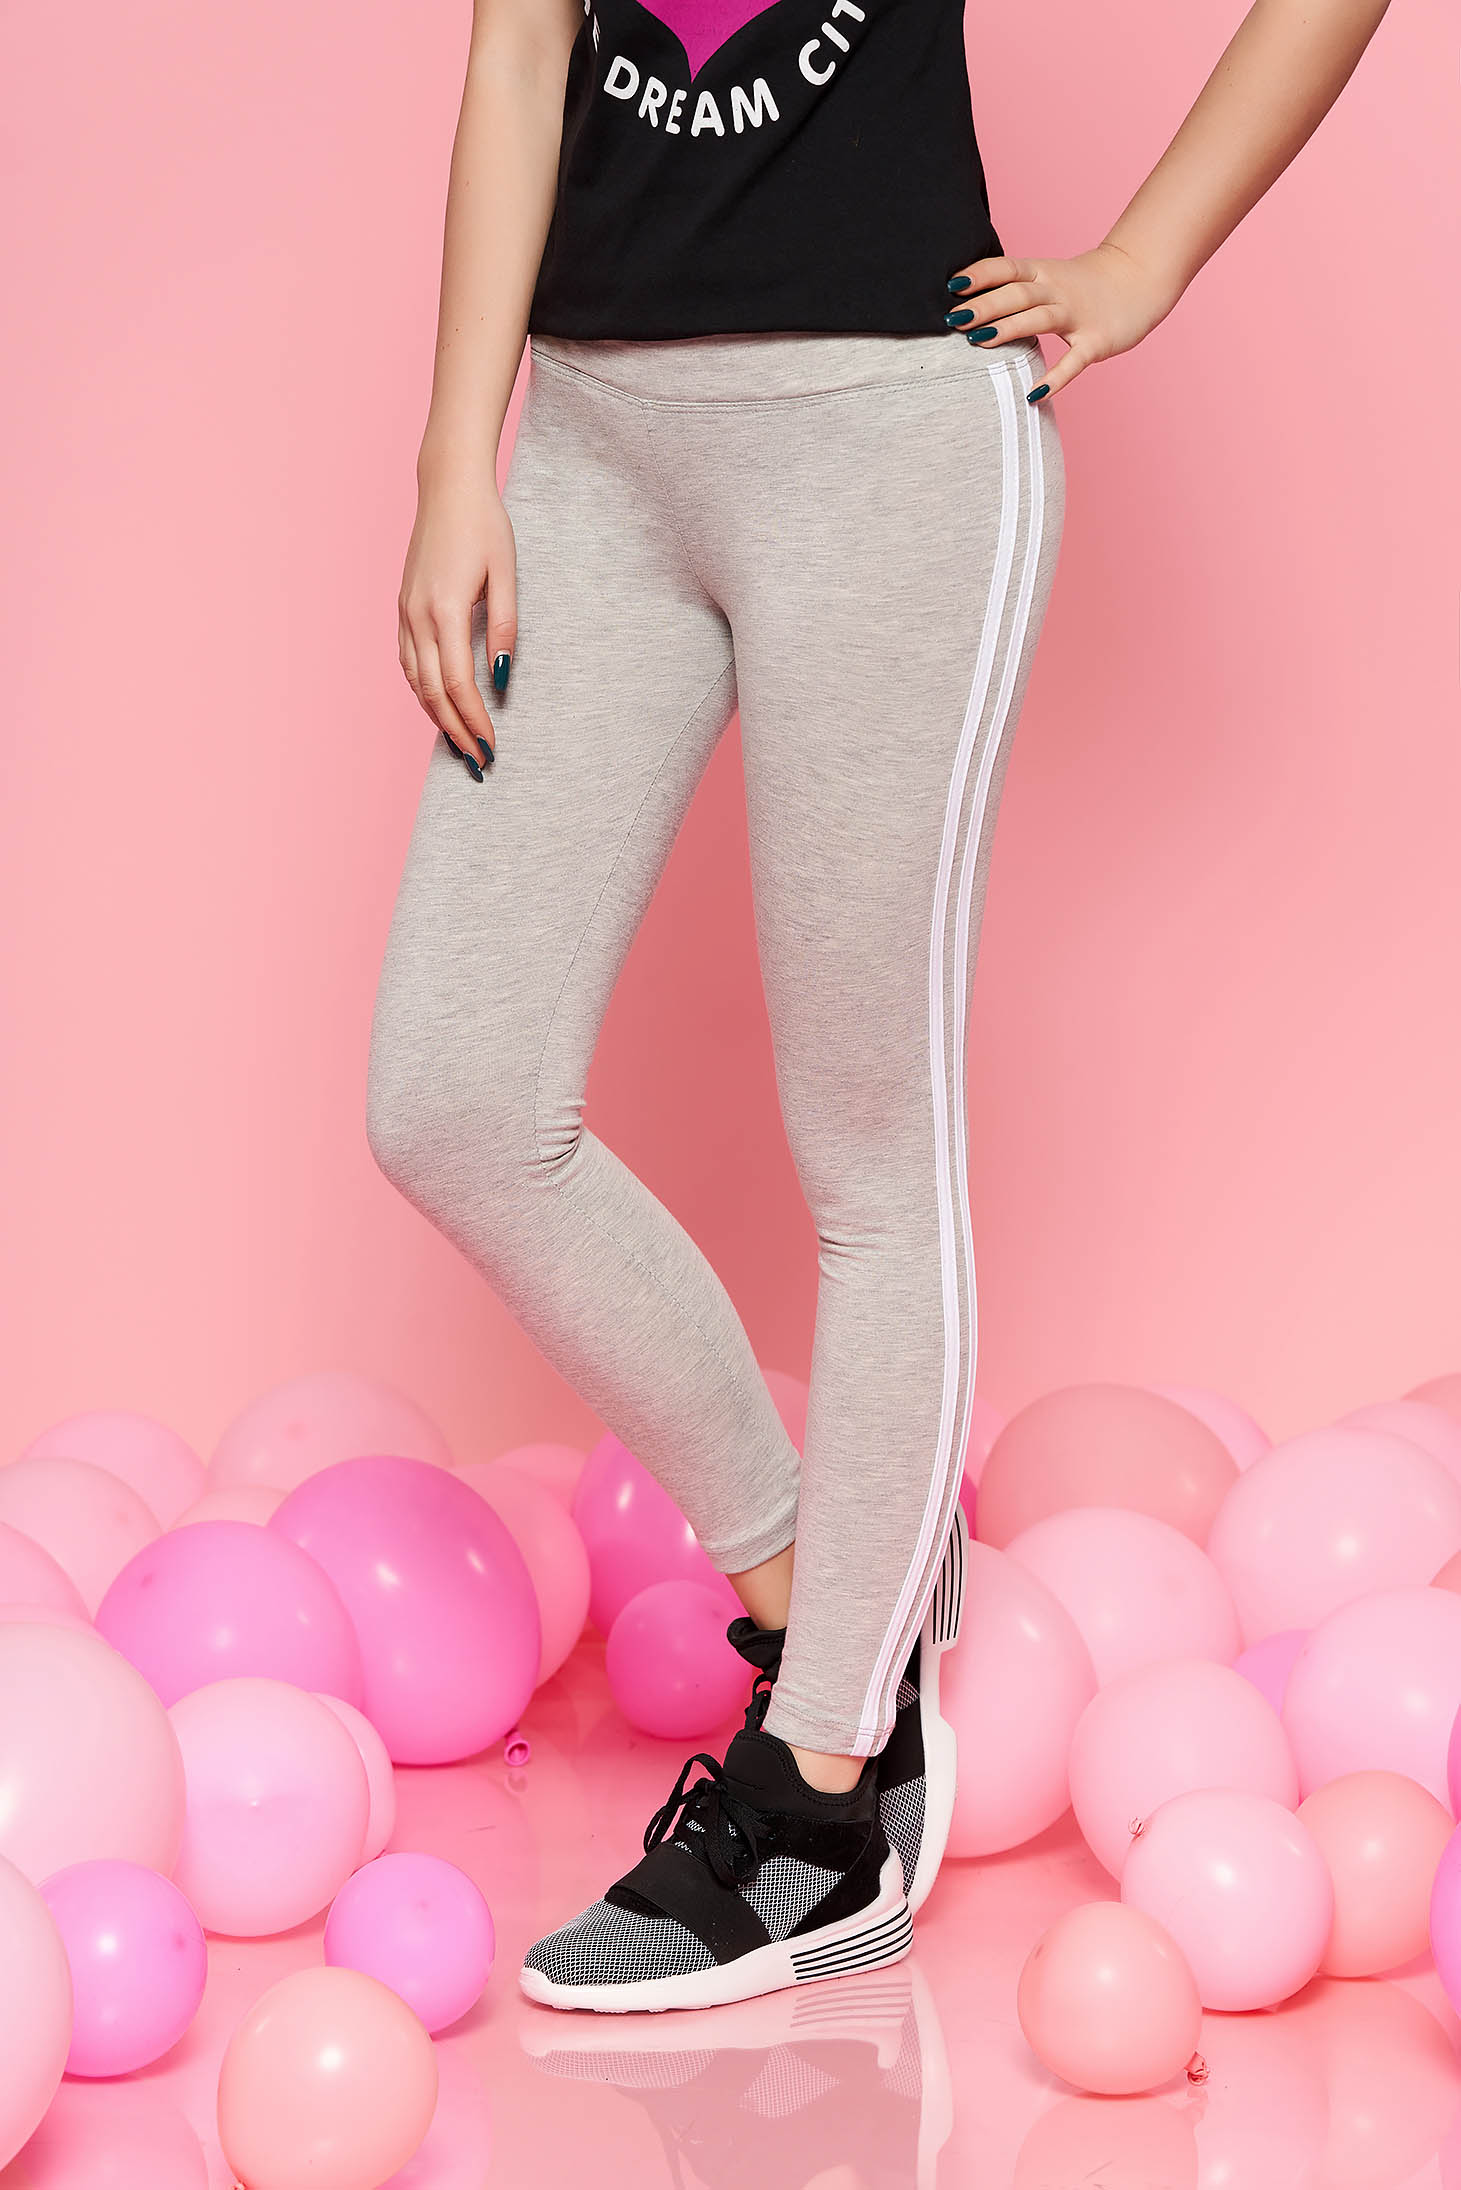 SunShine grey sporty tights with medium waist slightly elastic cotton with elastic waist